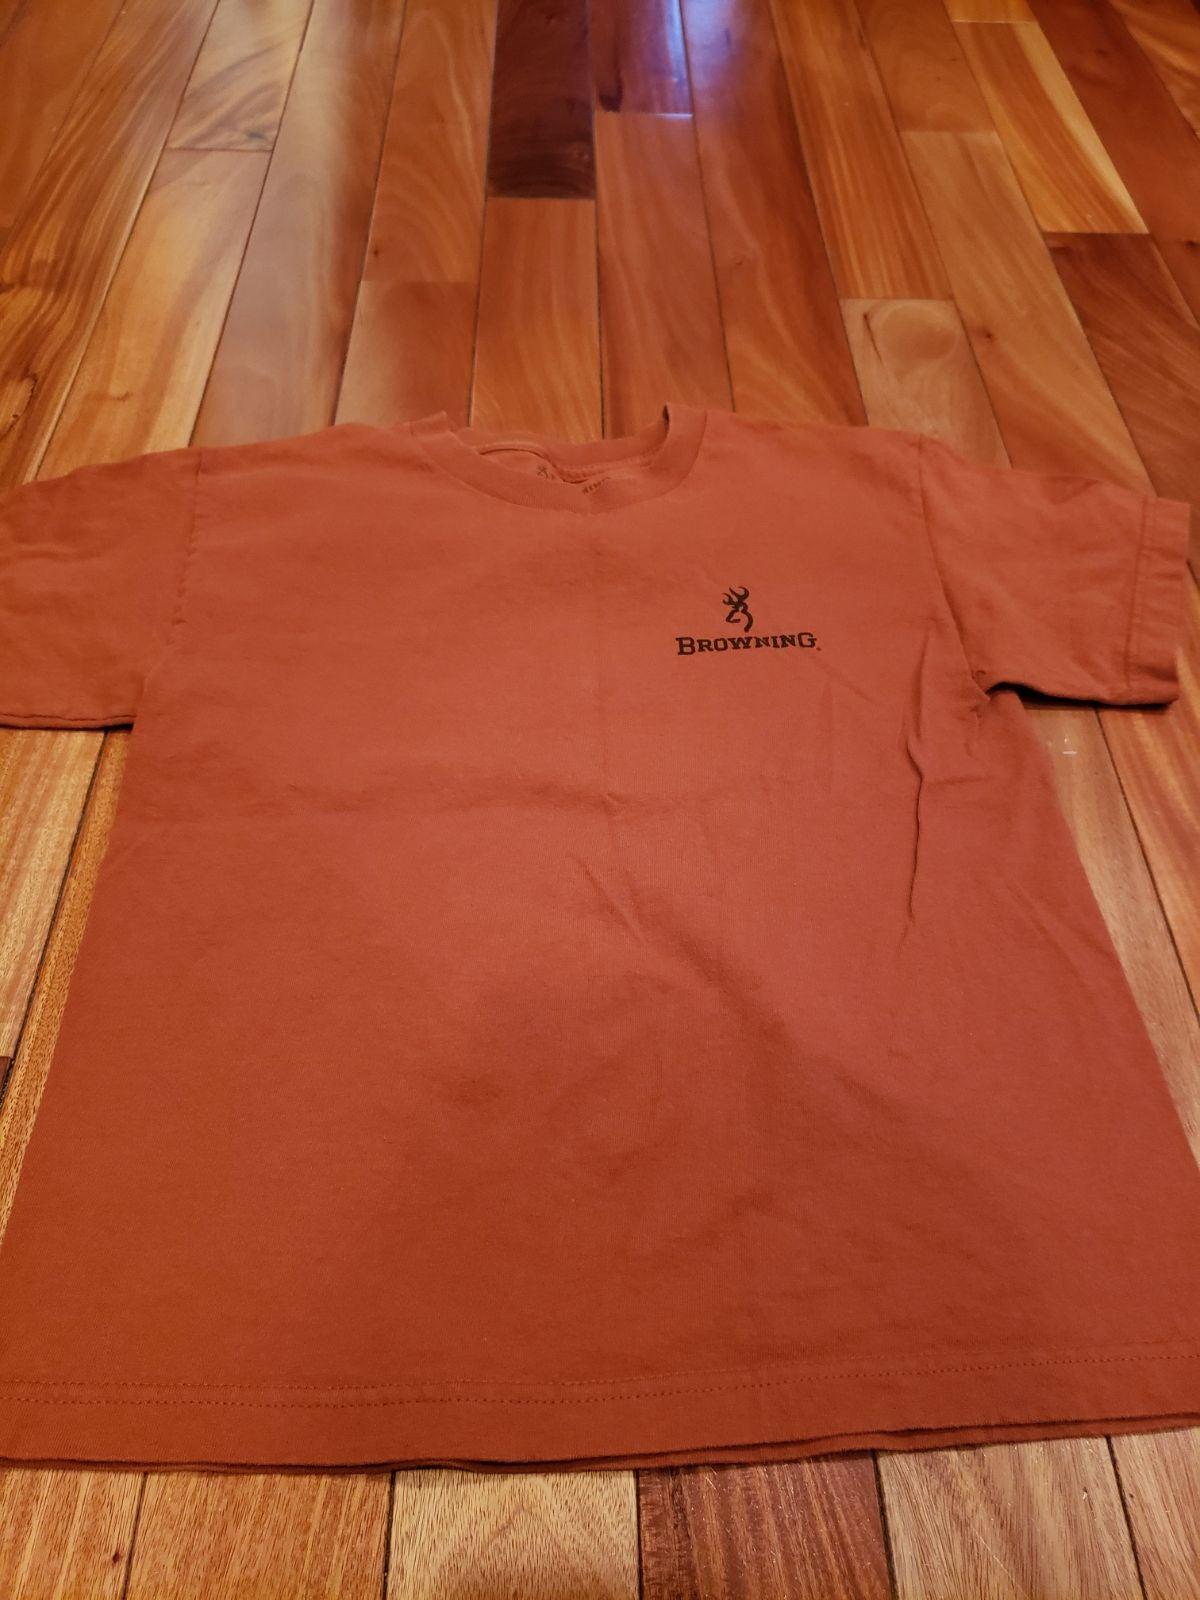 Browning Tshirt